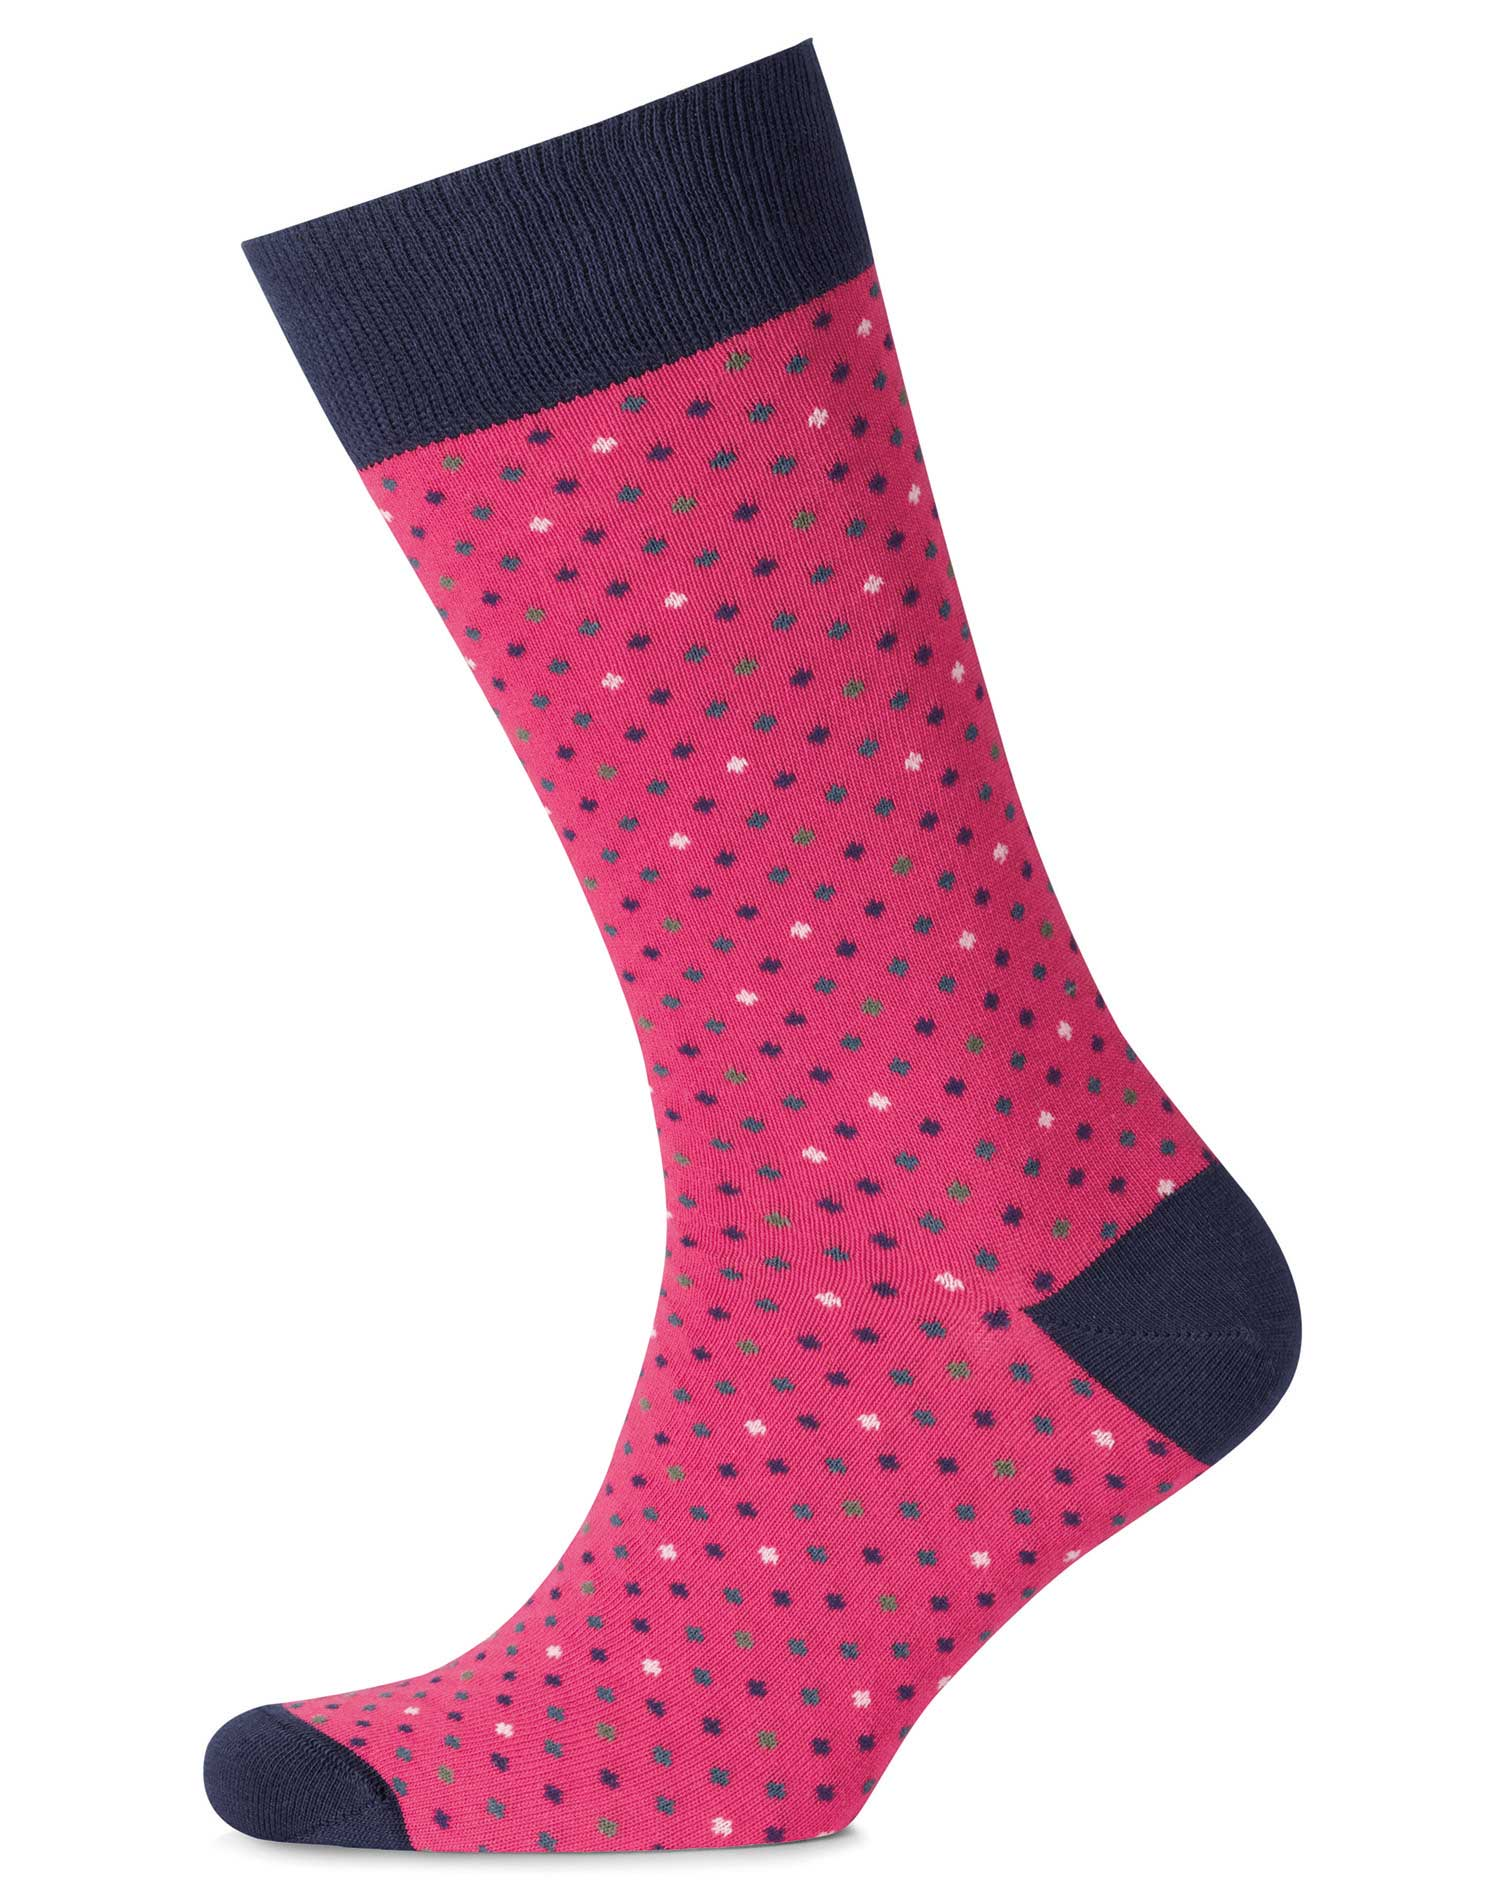 Pink Multi Dot Socks Size Medium by Charles Tyrwhitt